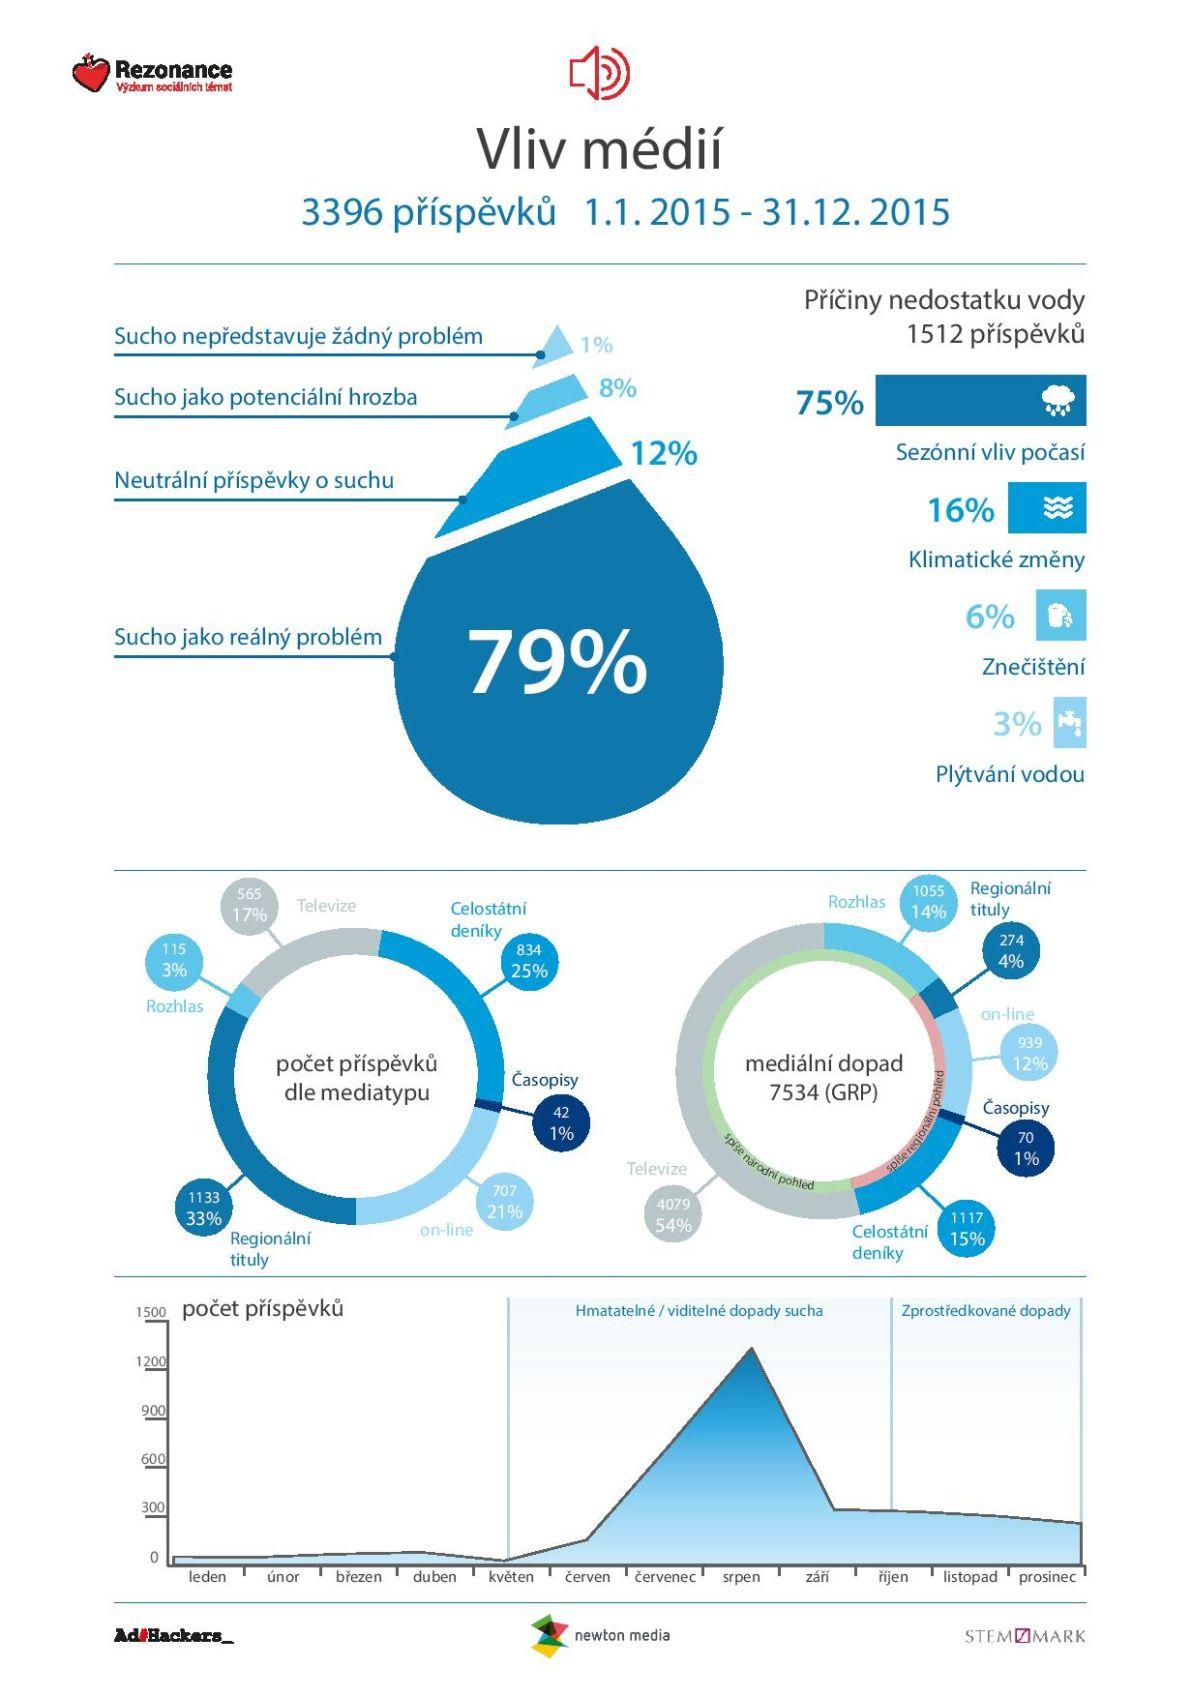 Vliv médií. Zdroj: Rezonance, výzkum sociálních médií, AdHackers, Newton media, Stem/Mark